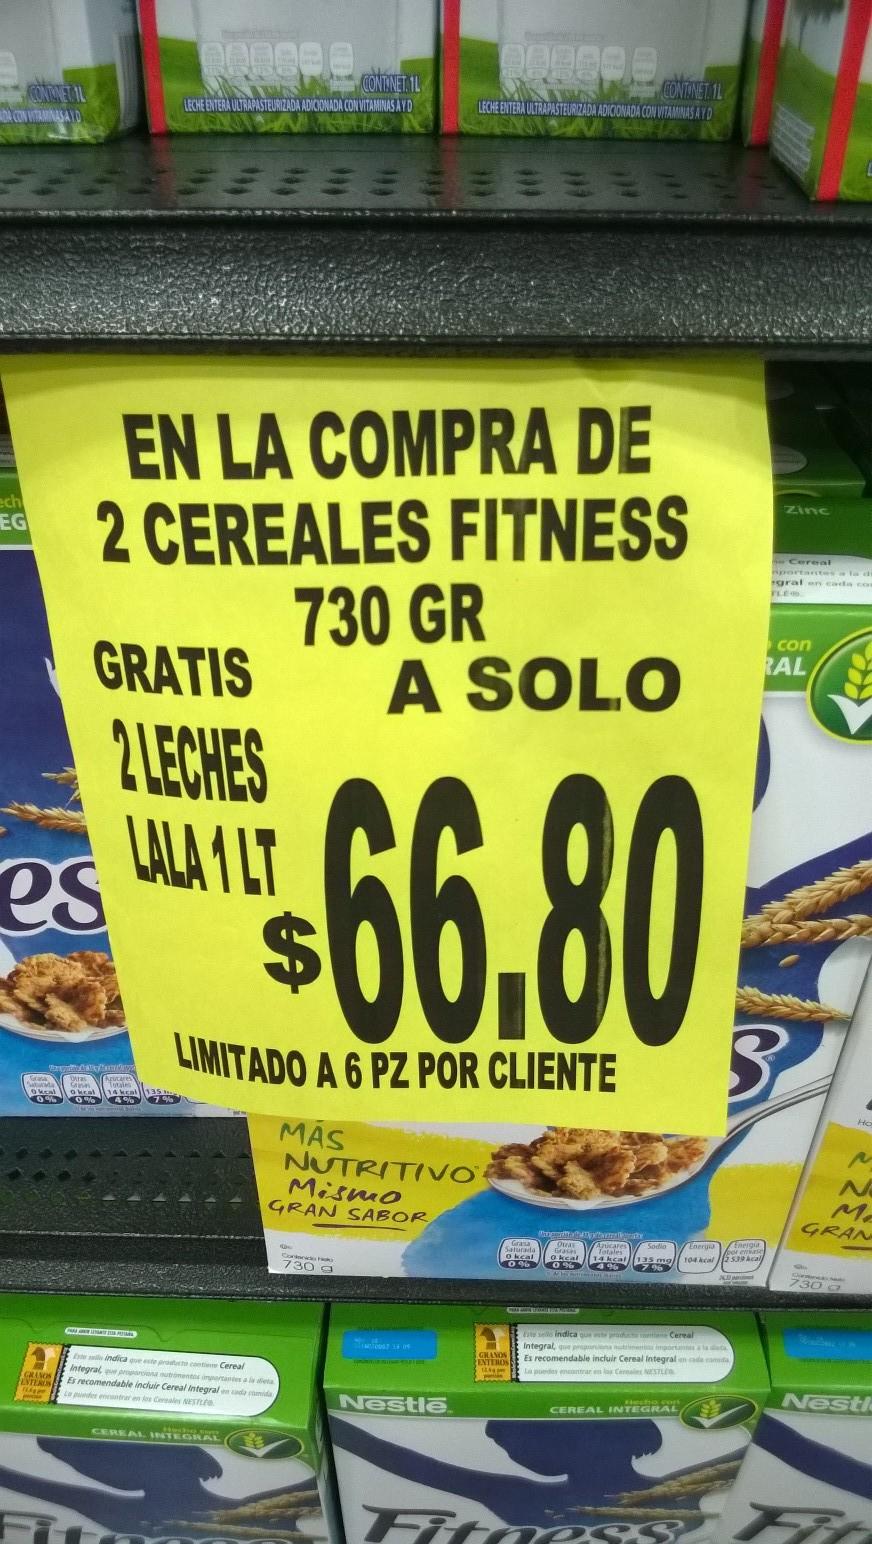 Soriana Súper: 2 leches Lala de 1 litro gratis al comprar 2 cereales Fitness en $66.80